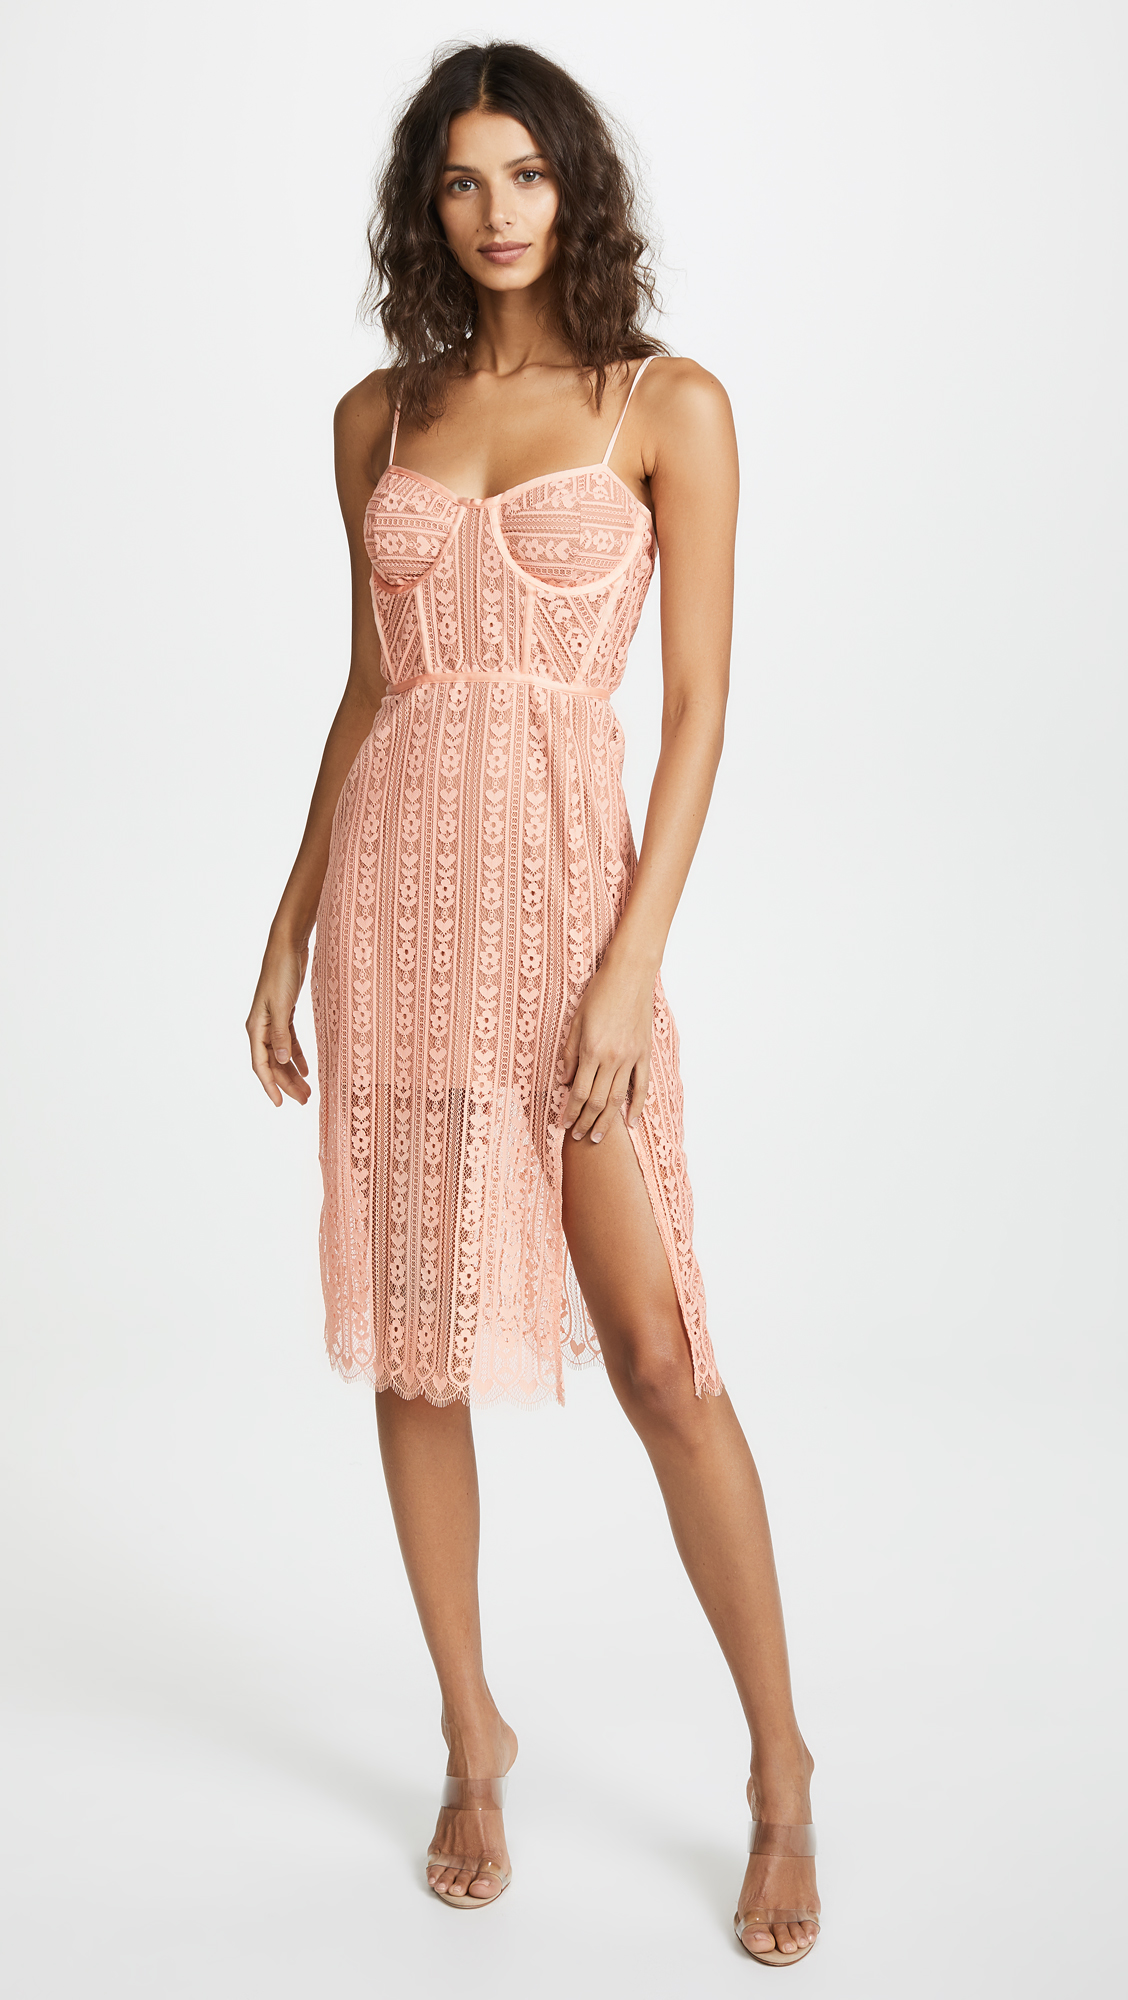 For Love Lemons Dakota Lace Dress Shopbop Save Up To 25